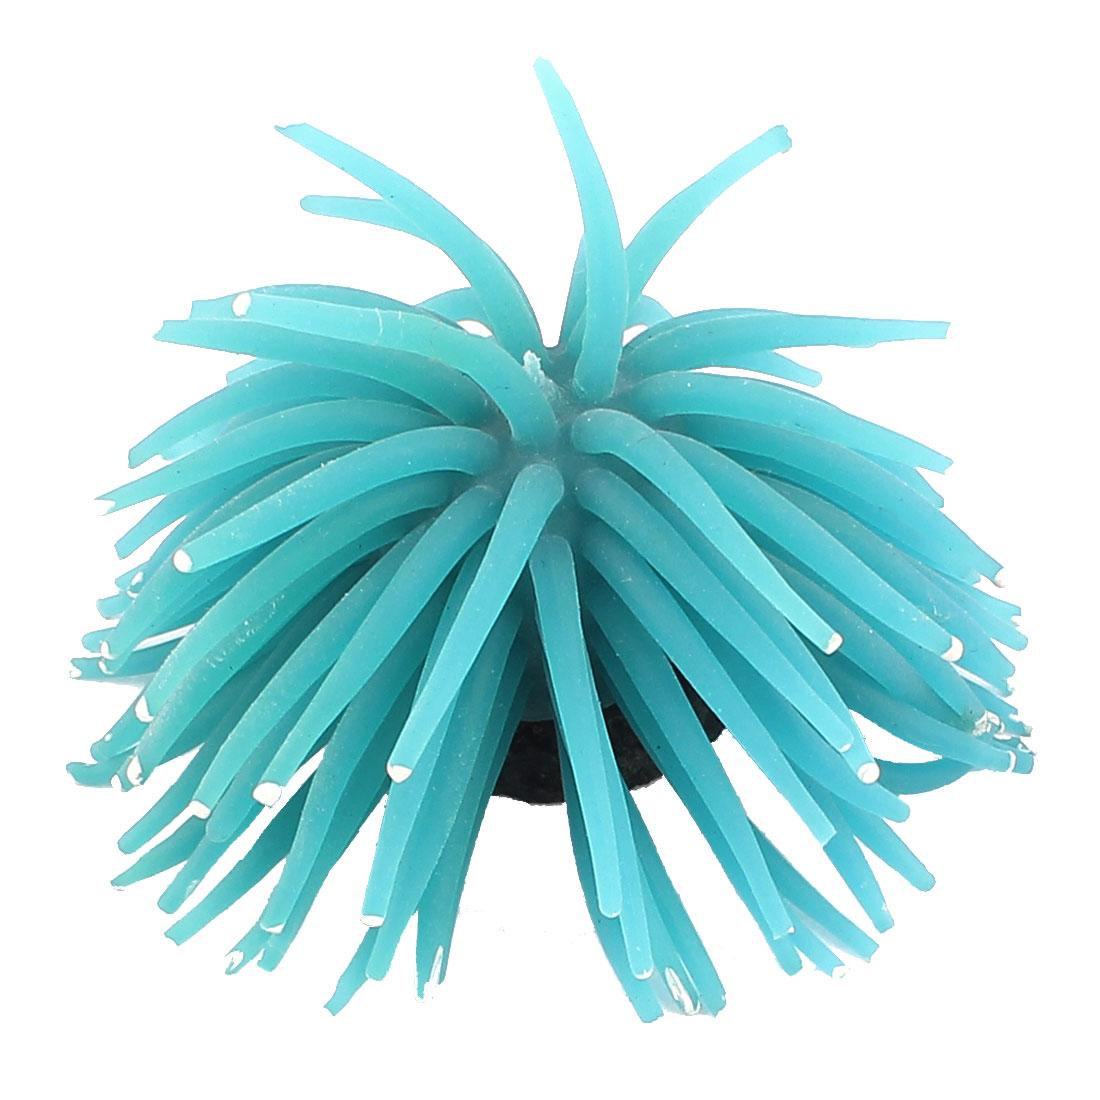 Aquarium Soft Silicone Artificial Sea Coral Anemone Landscaping Decor Blue